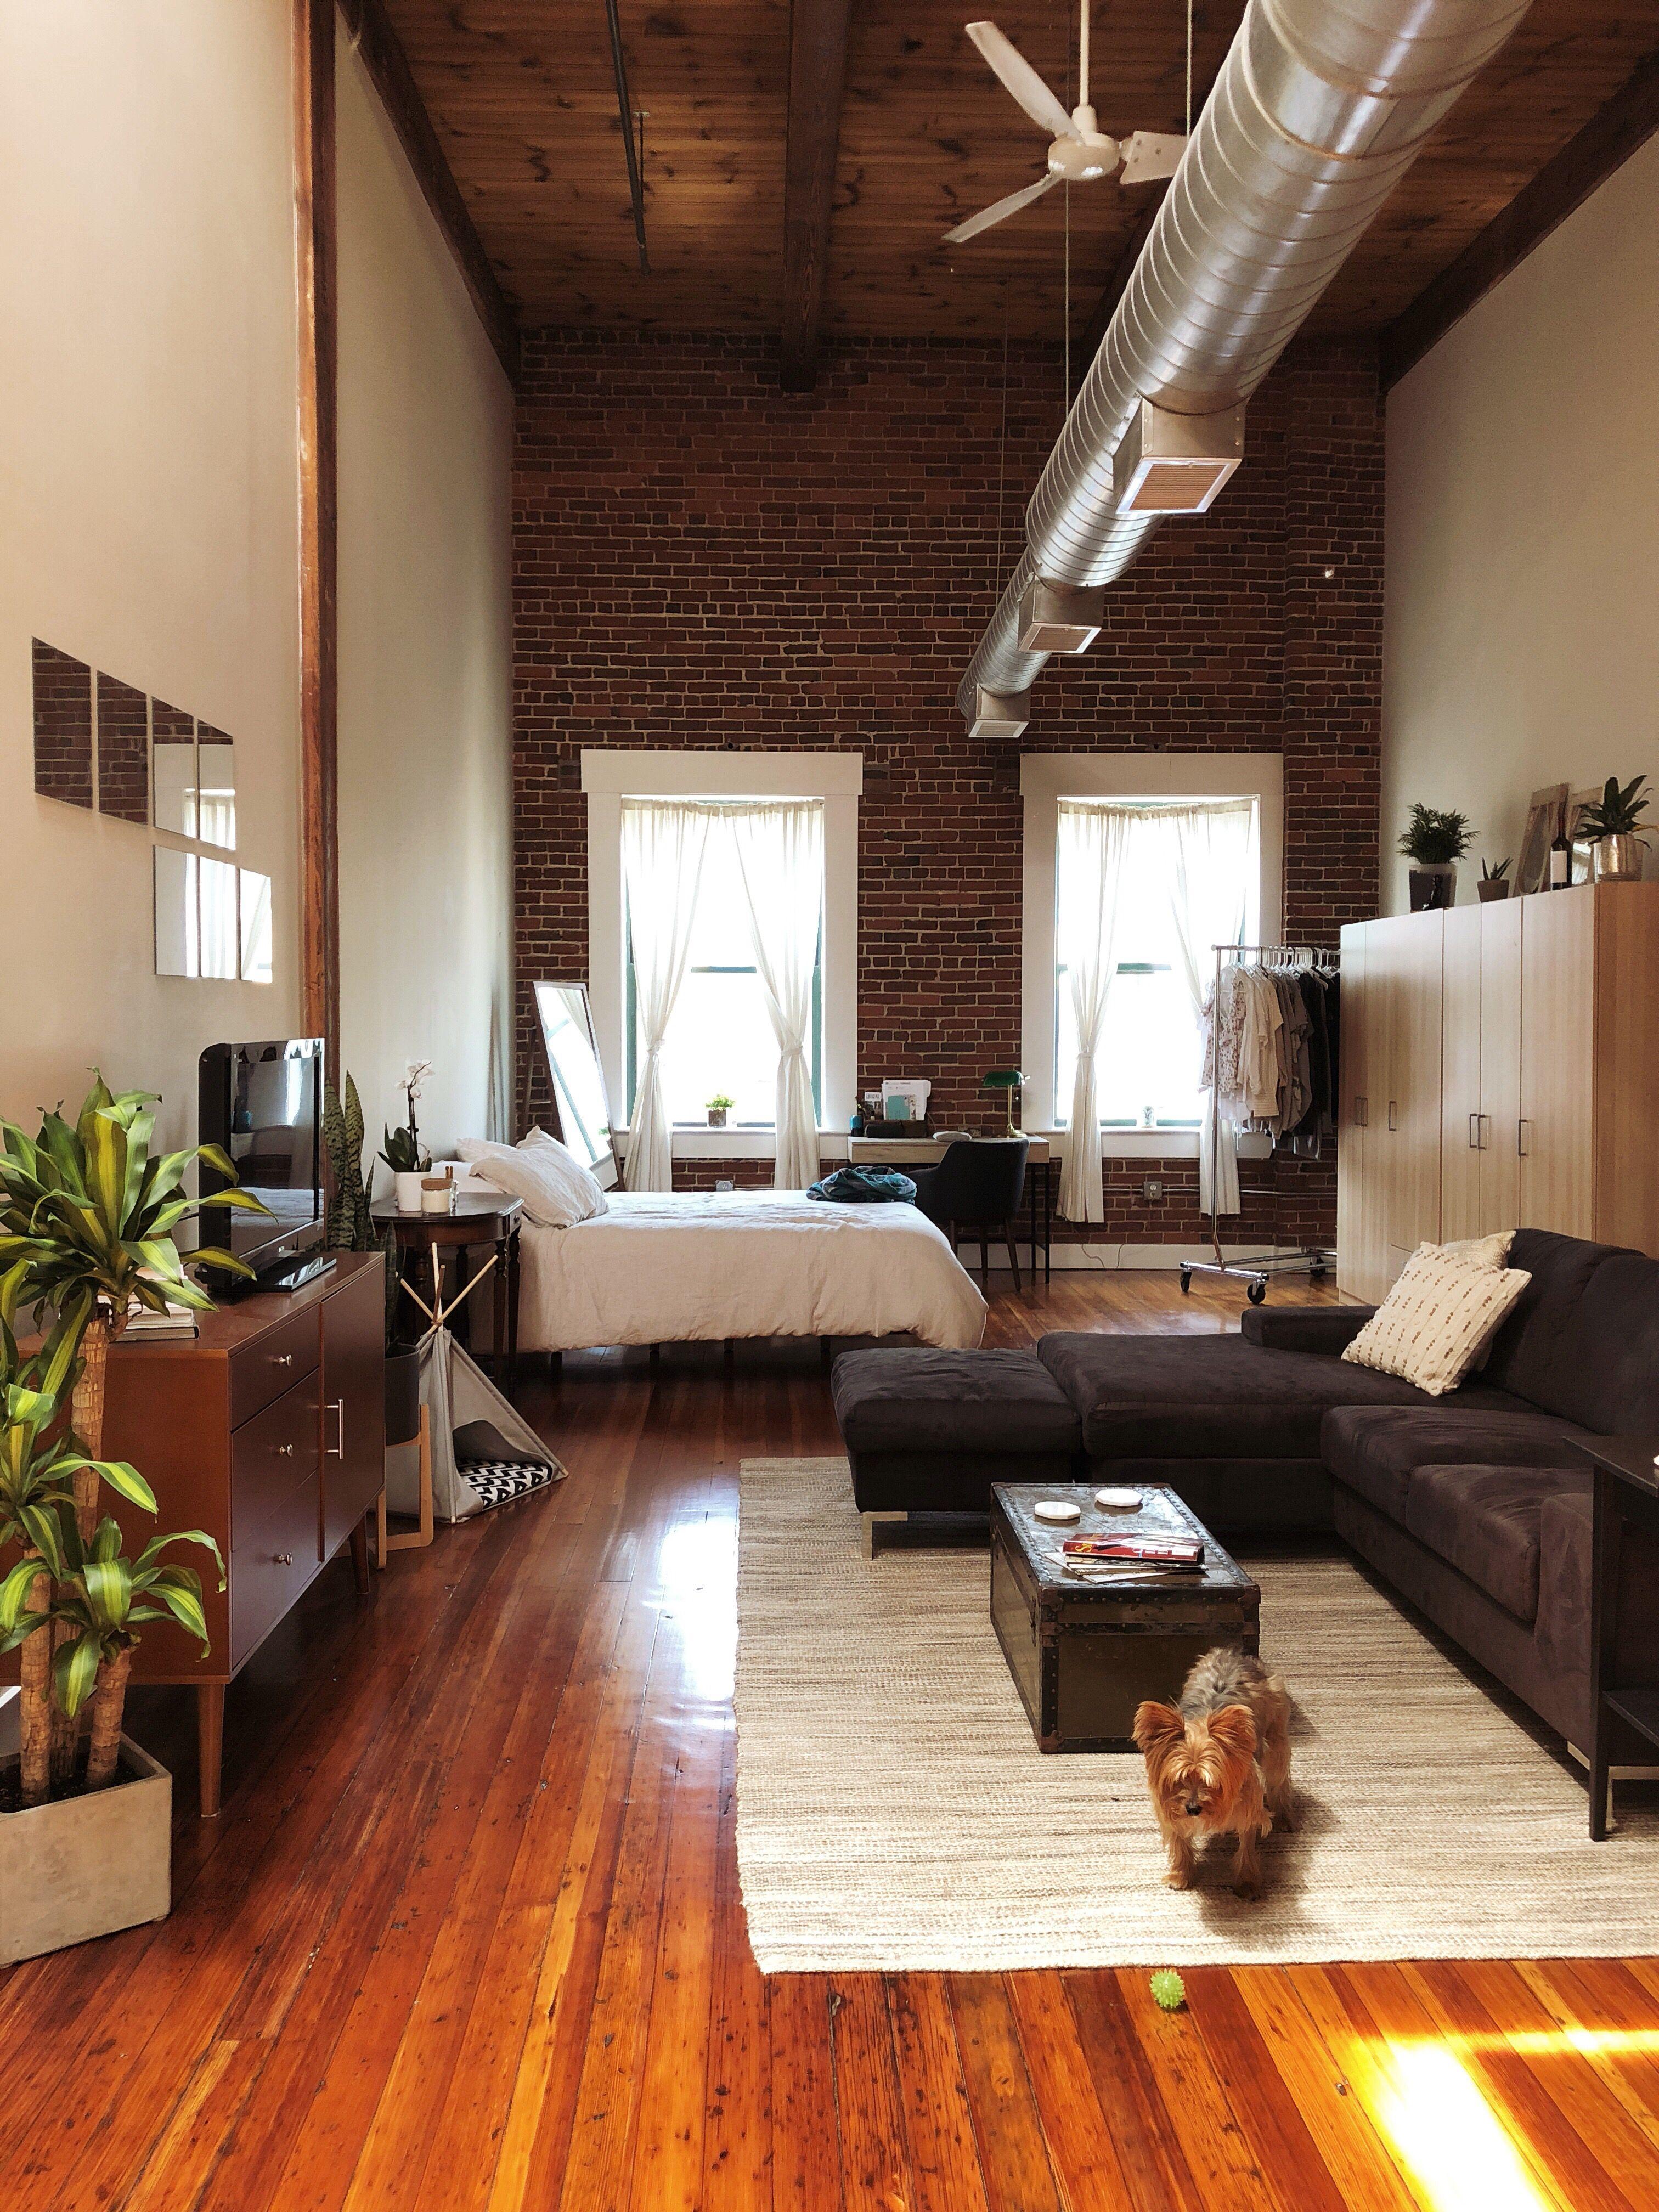 Loft Studio Apartment Boston Apartment Decor Downtown Apartment Boston Apartment Get bedroom apartments boston